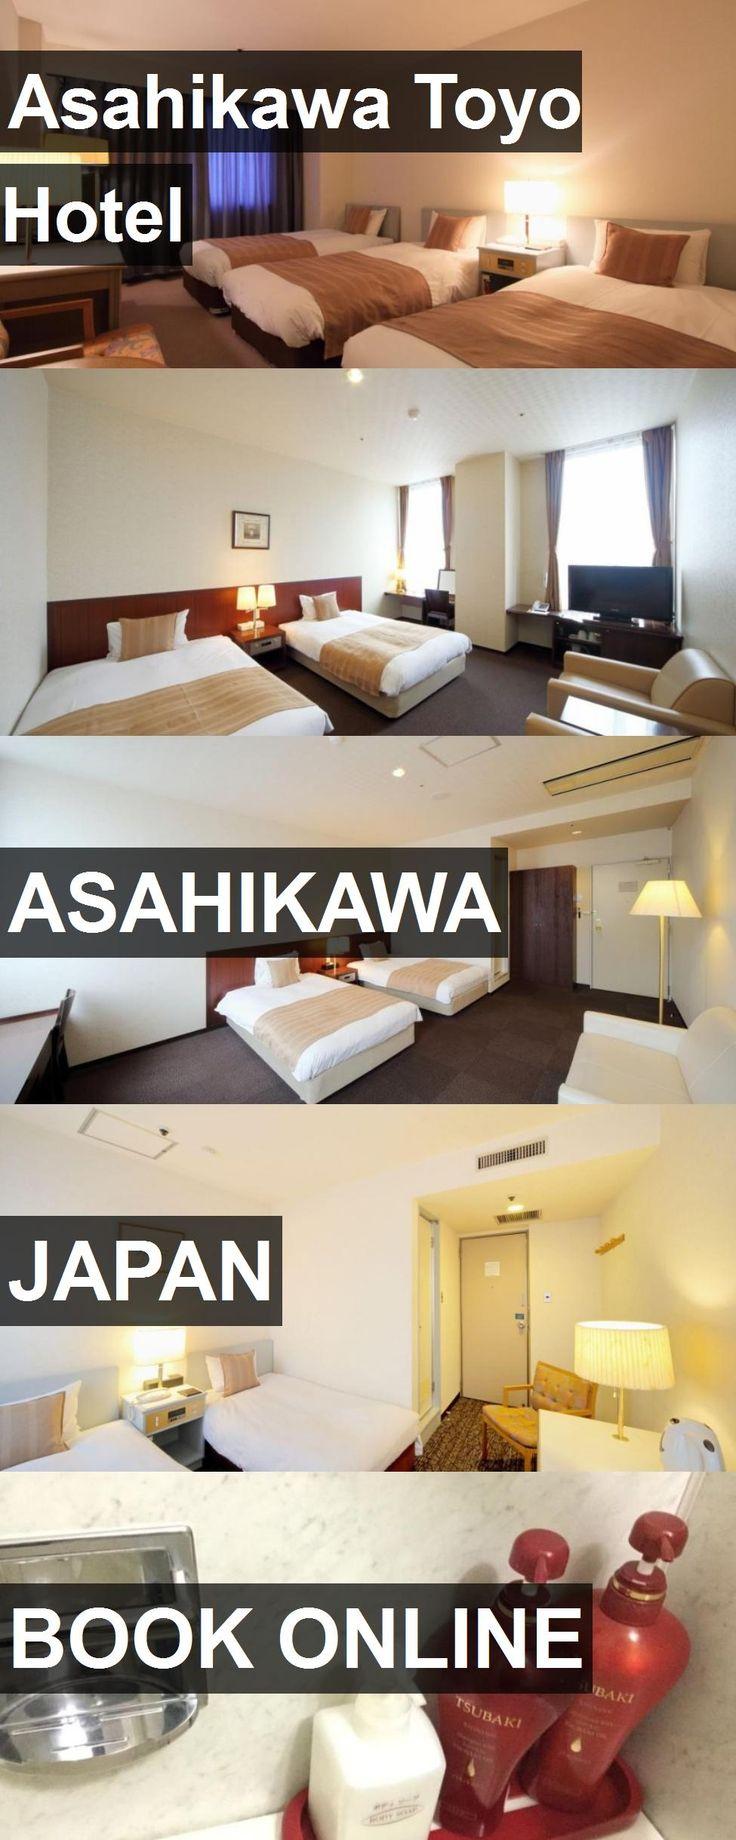 Hotel Asahikawa Toyo Hotel in Asahikawa, Japan. For more information, photos, reviews and best prices please follow the link. #Japan #Asahikawa #AsahikawaToyoHotel #hotel #travel #vacation